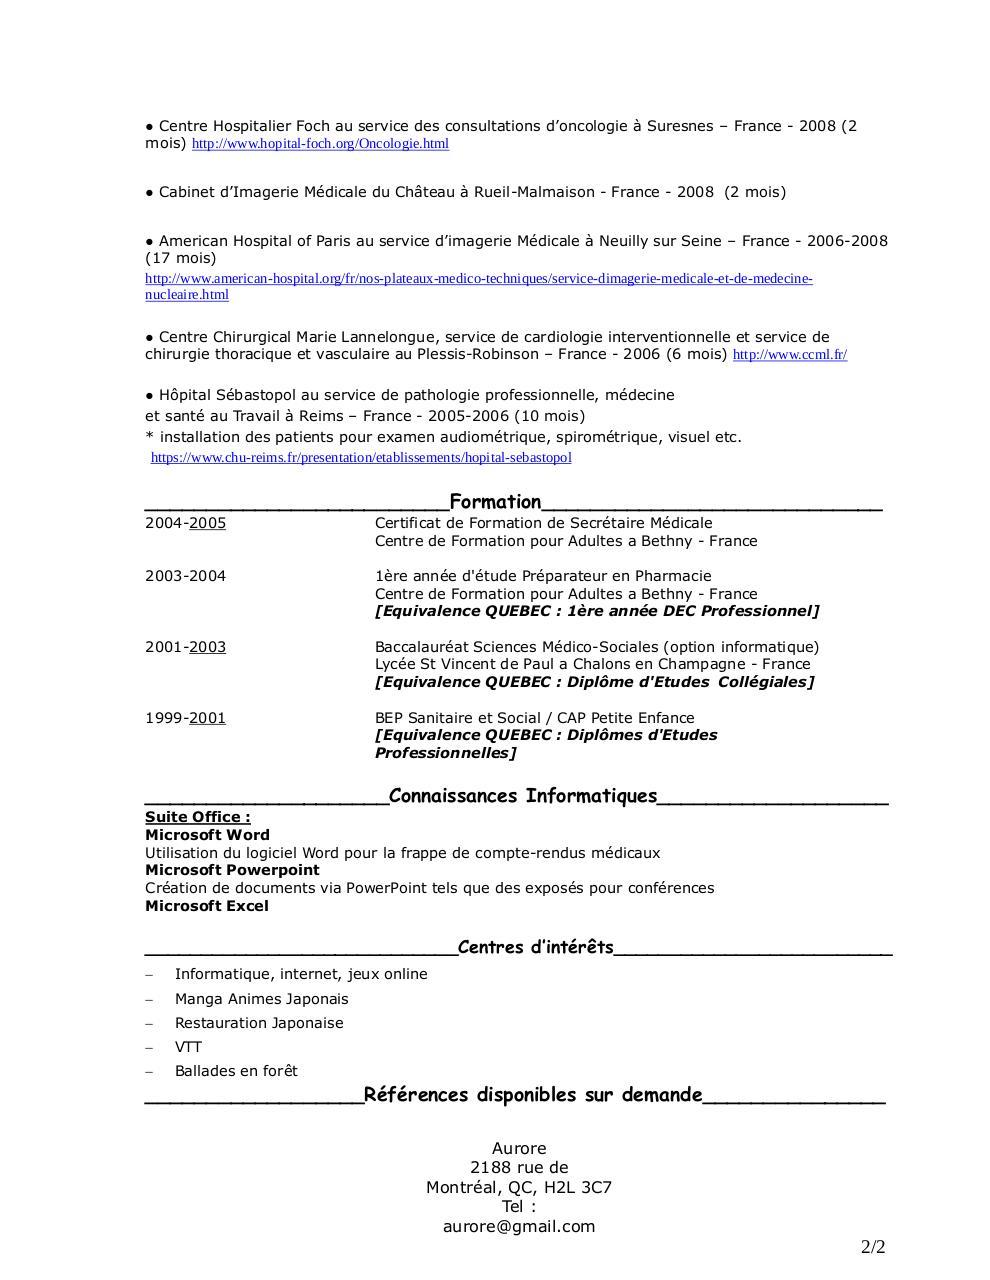 cv secr u00e9taire m u00e9dicale aurore pdf pvtistes par aurore